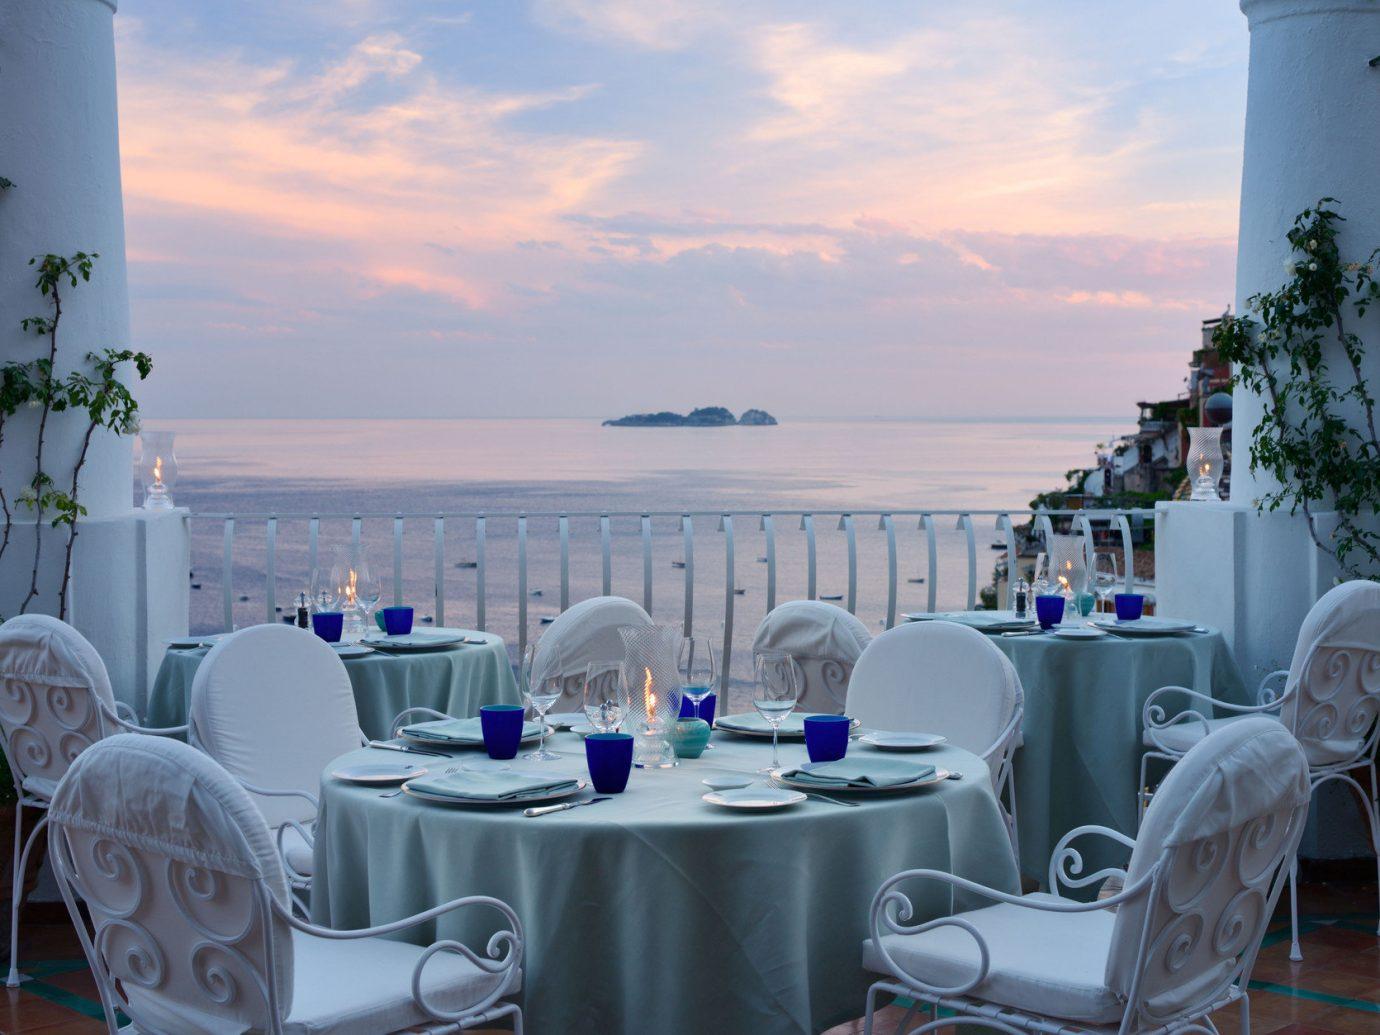 Outdoor dining at Le Sirenuse, Positano